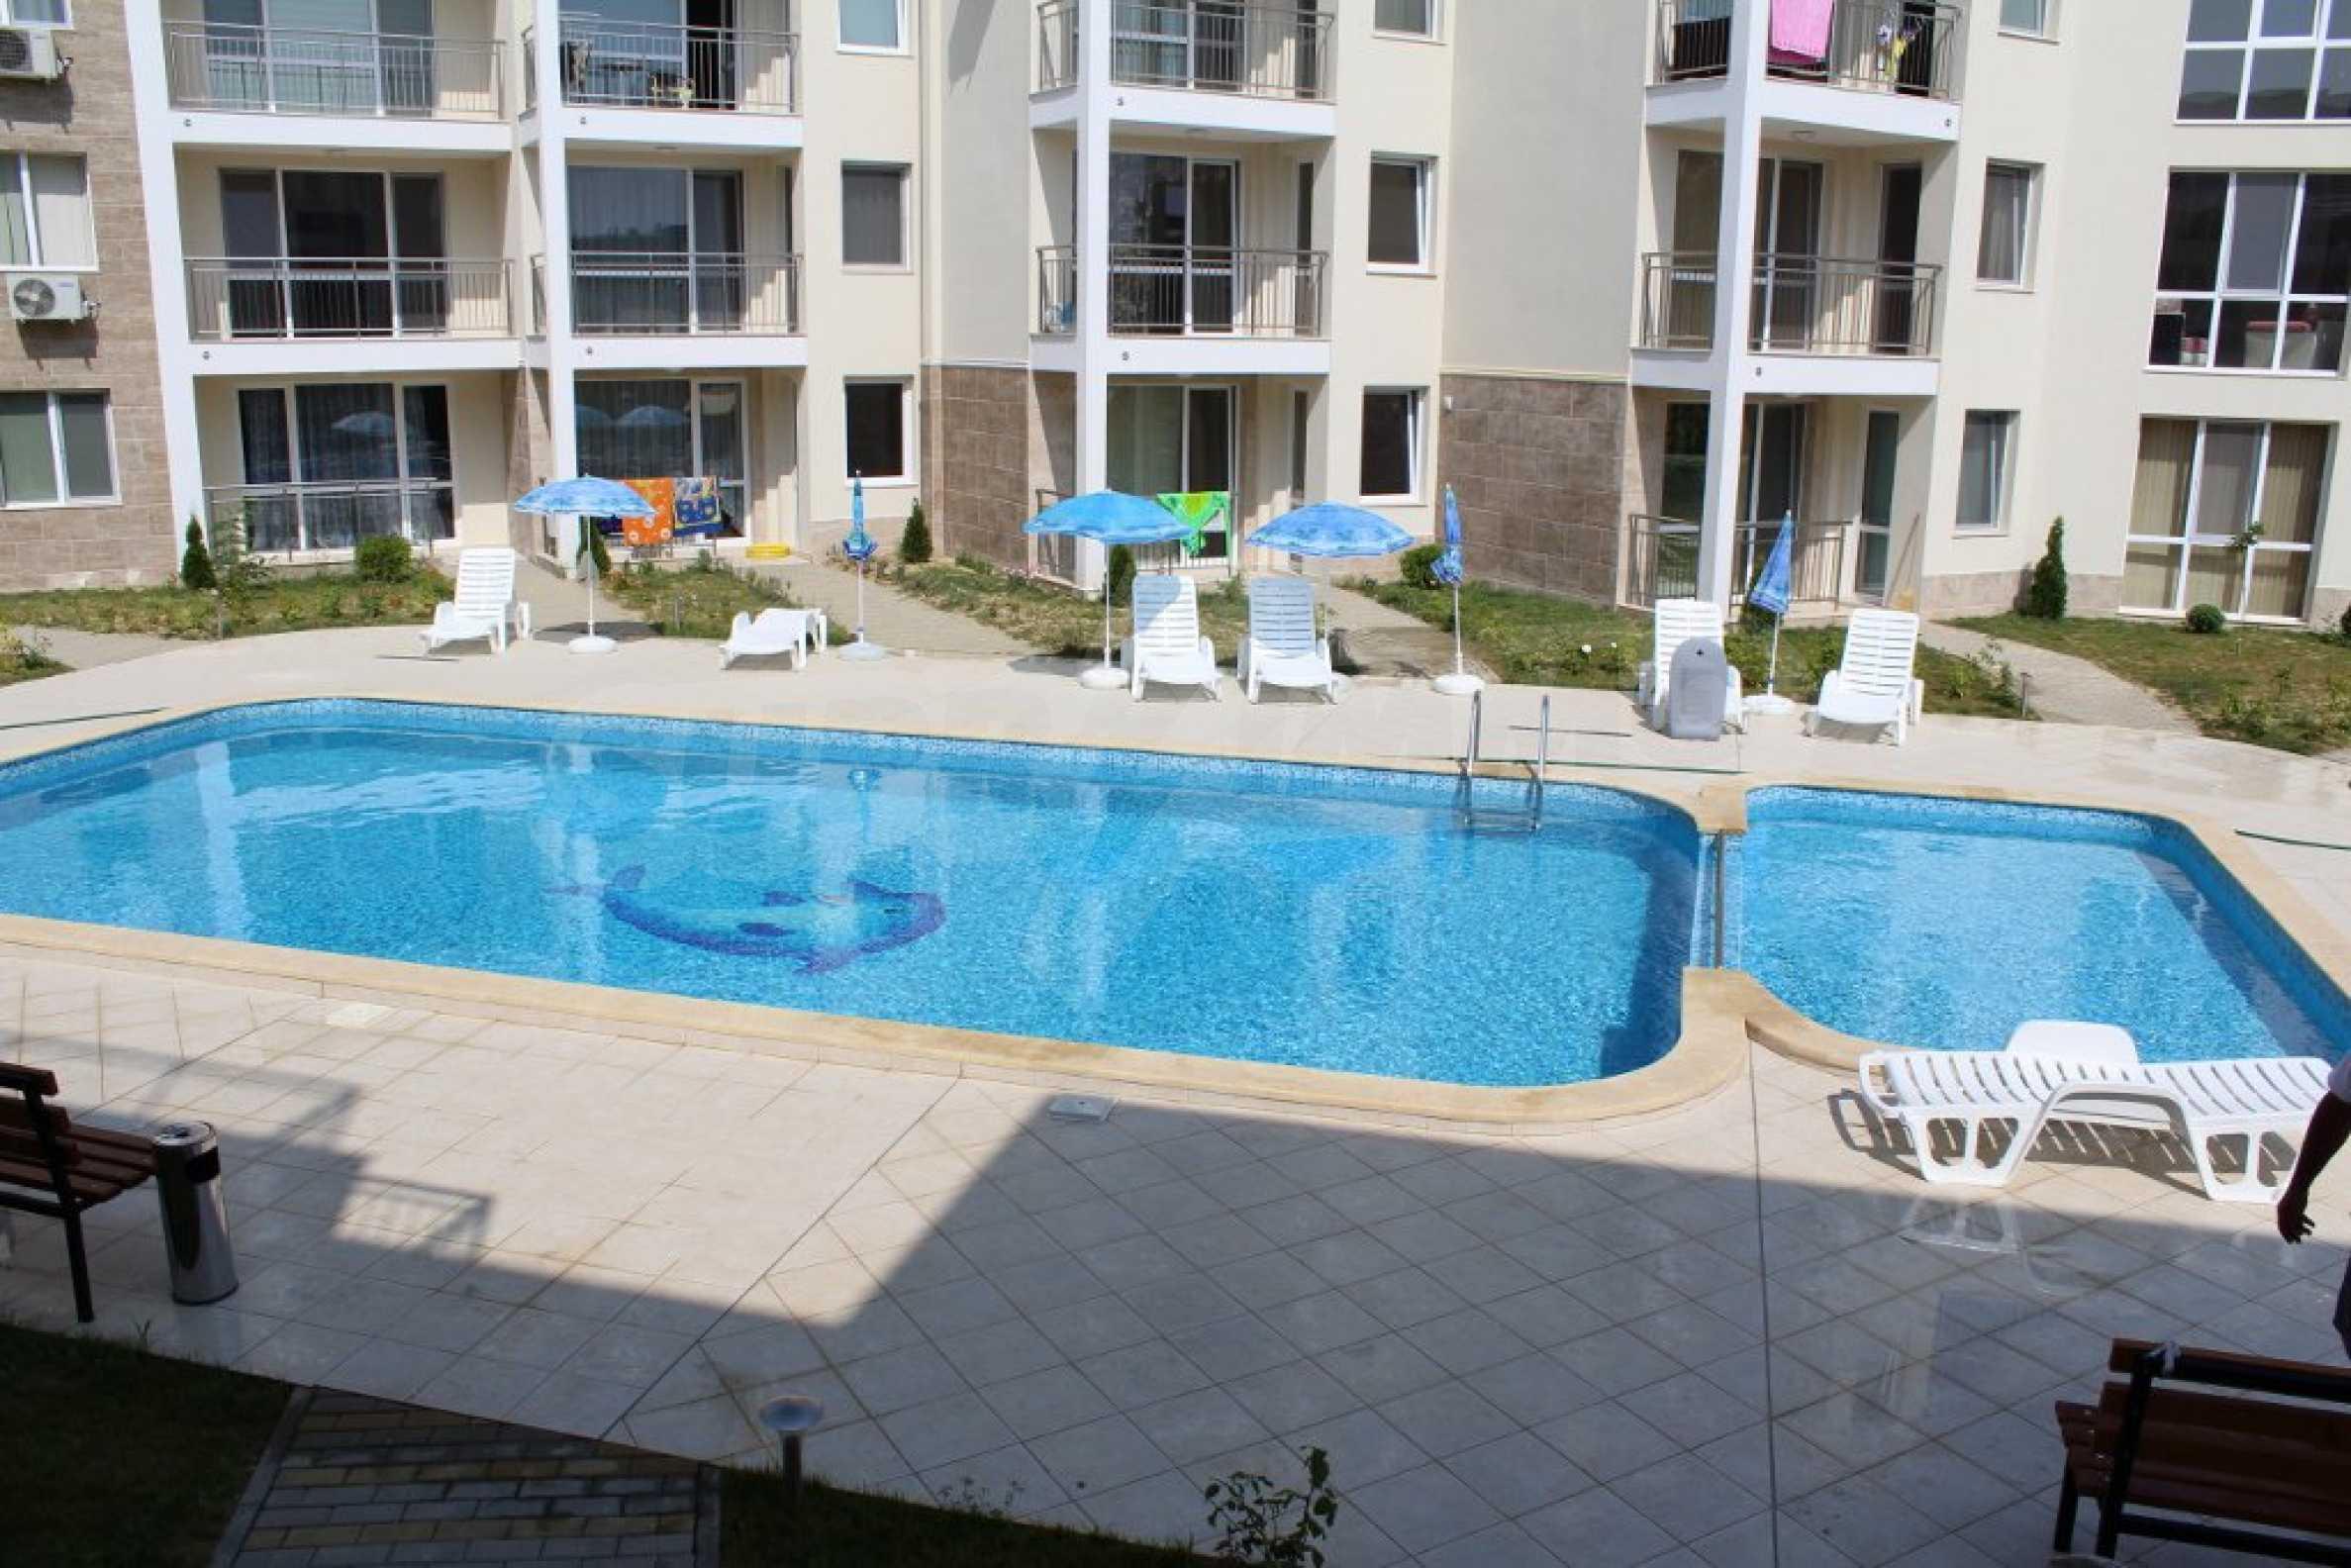 Тристаен апартамент близо до плажа в Бяла 12